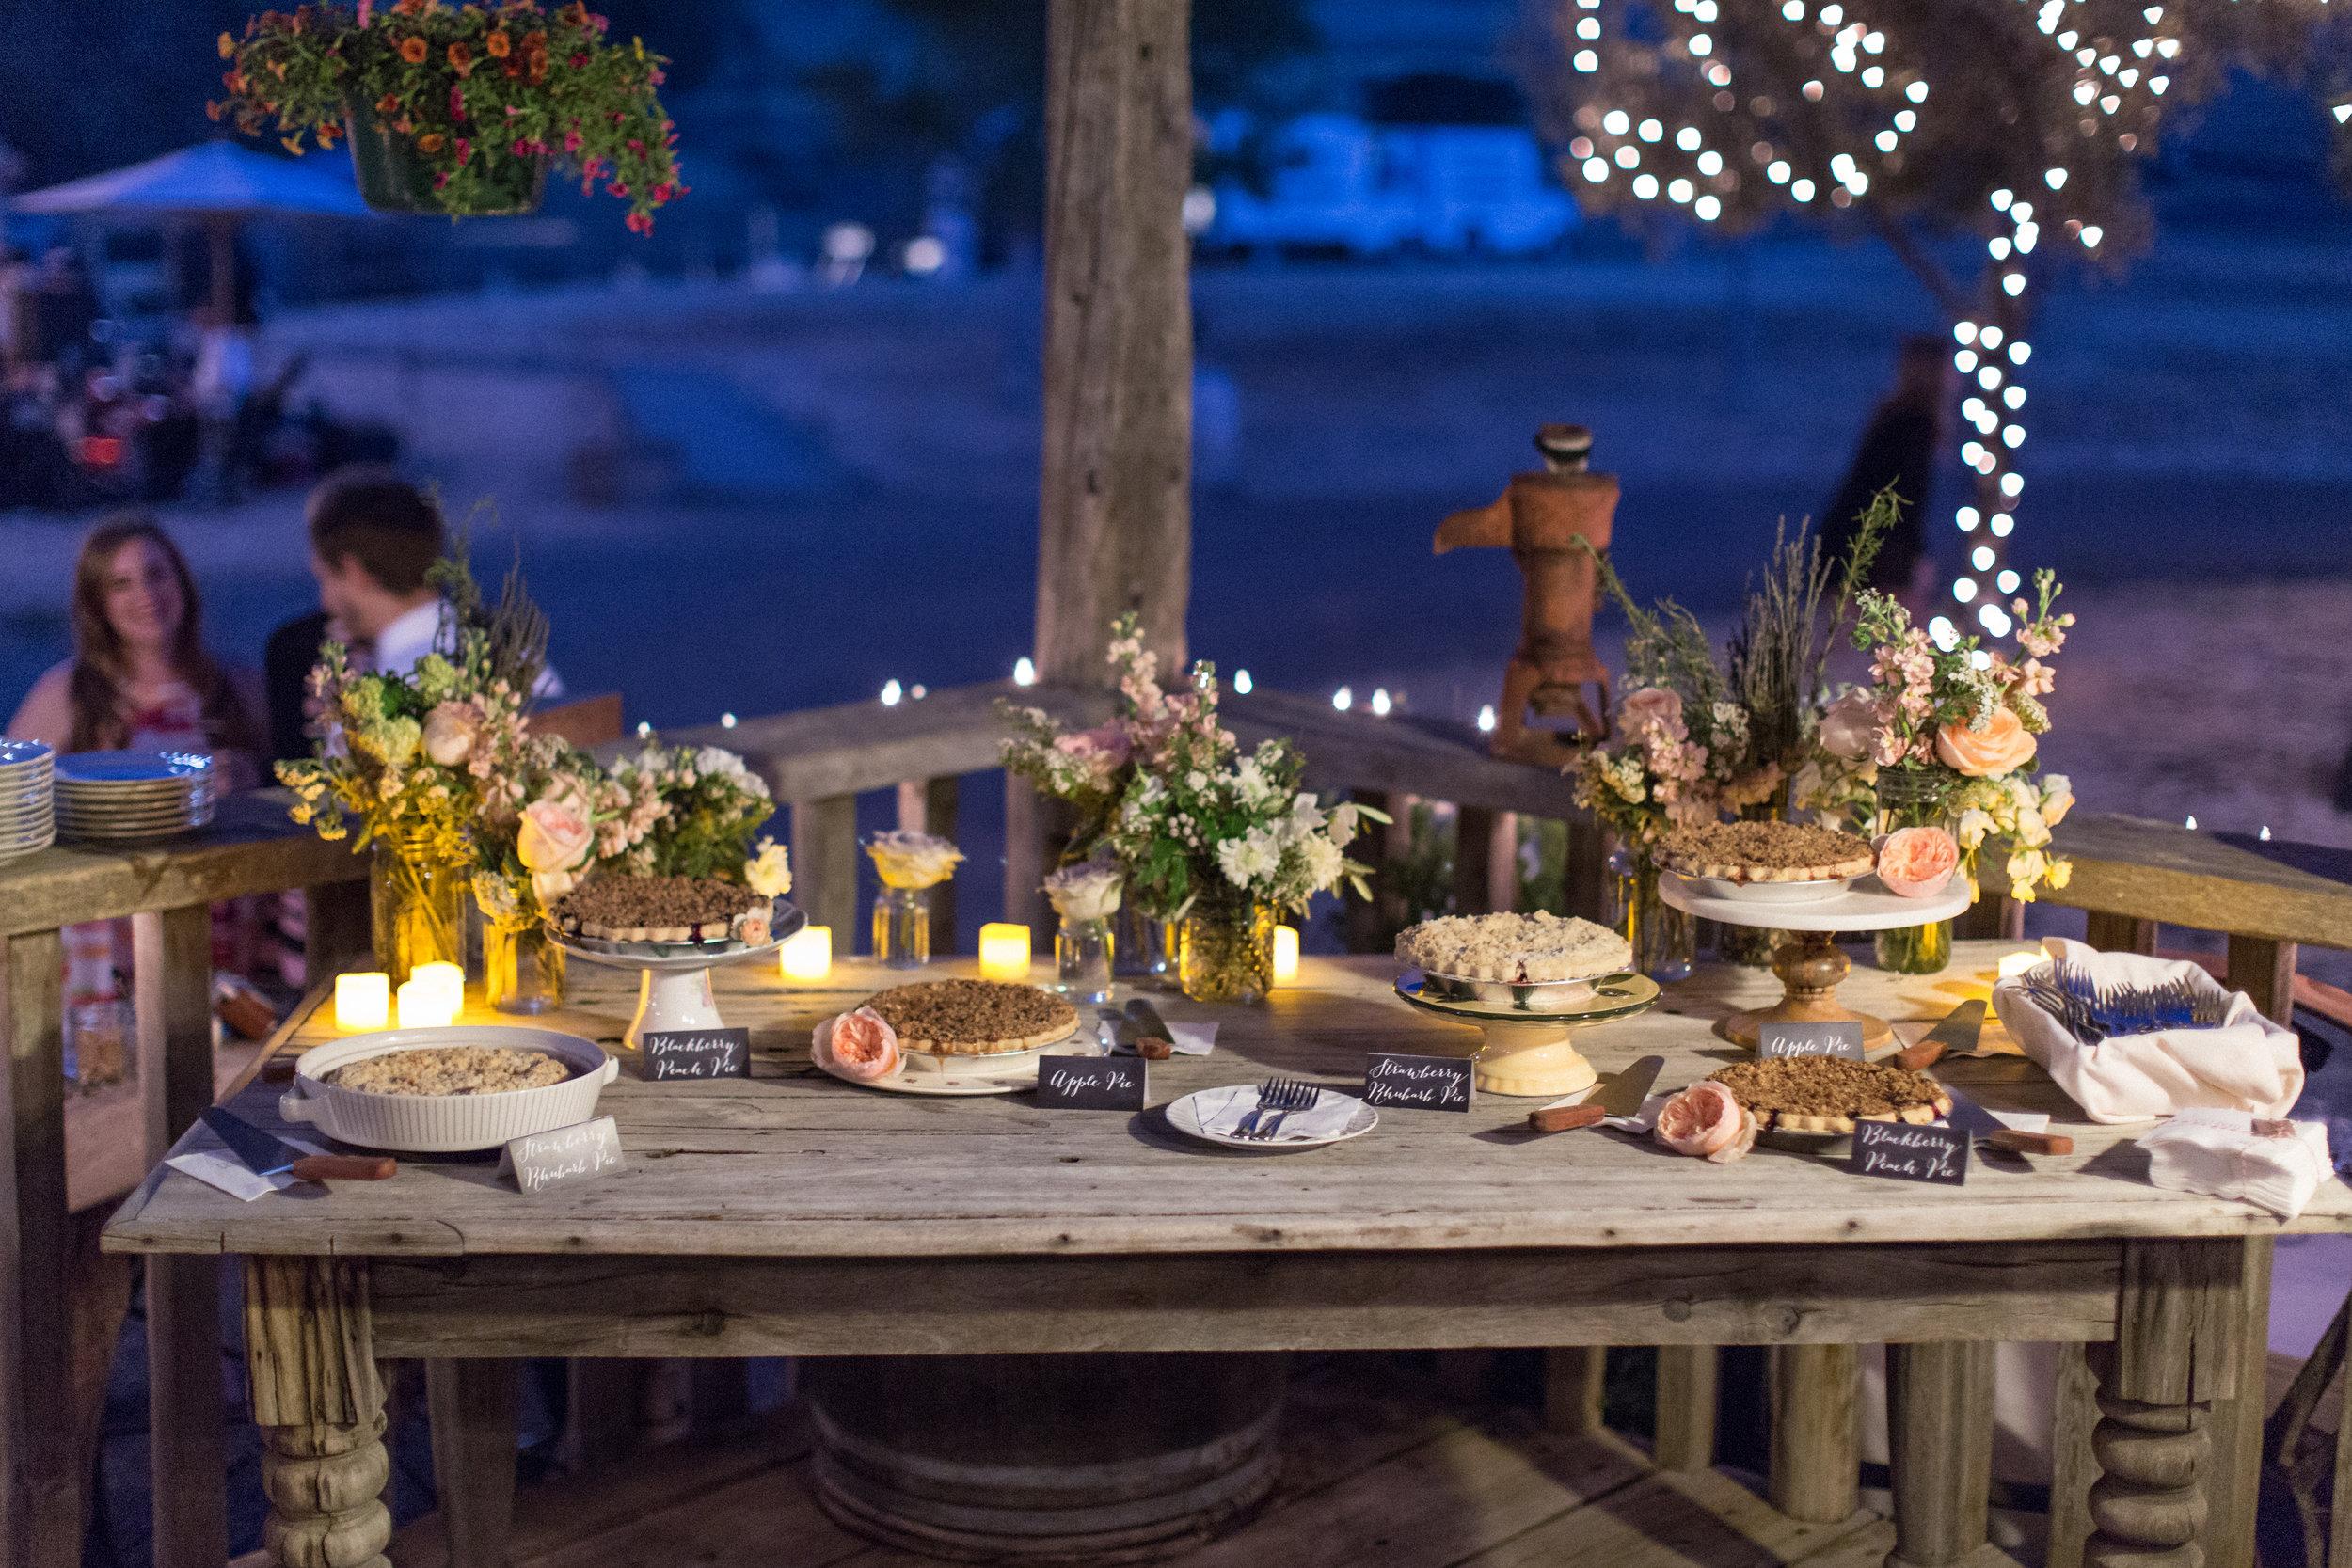 www.santabarbarawedding.com | Kiel Rucker Photography | Joelle Charming Wedding Planner | Figueroa Mountain Farmhouse | Ella & Louie Flowers | La Tavola Linens | Reception